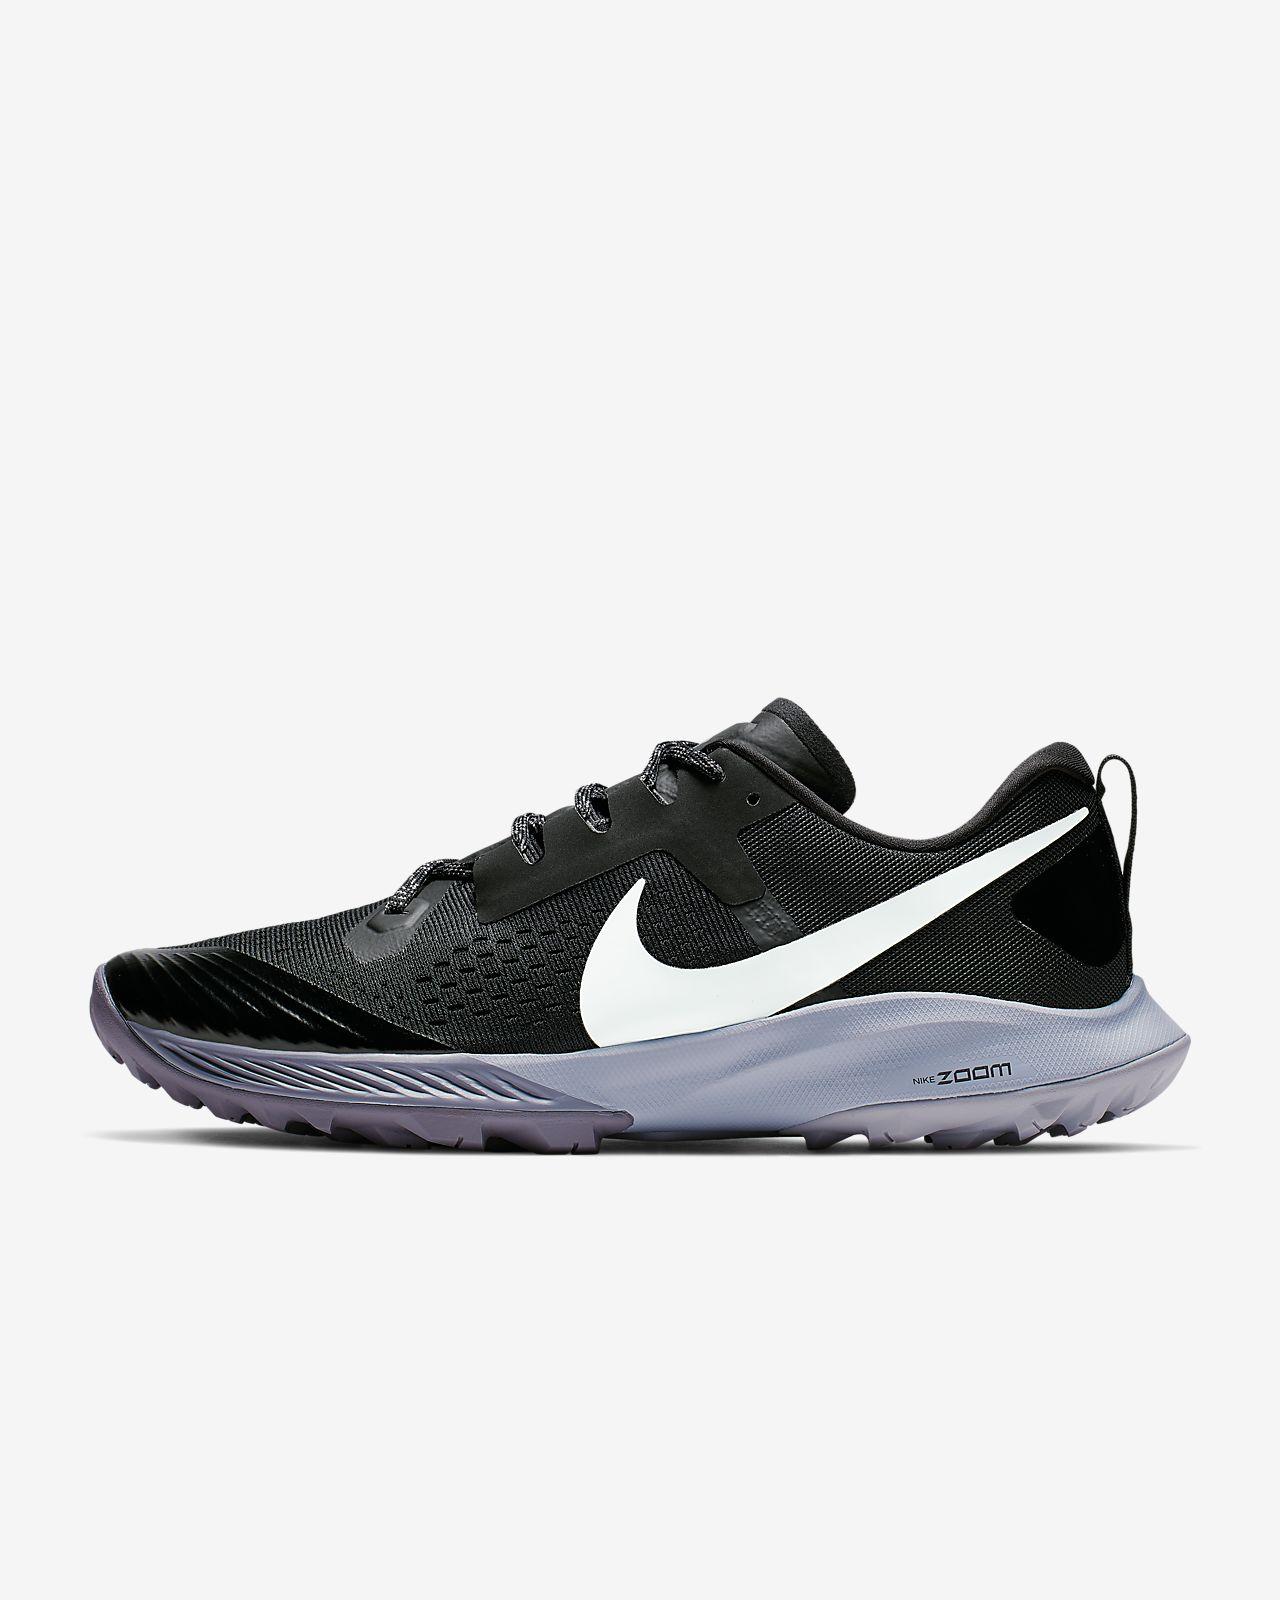 Sapatilhas de running Nike Air Zoom Terra Kiger 5 para homem